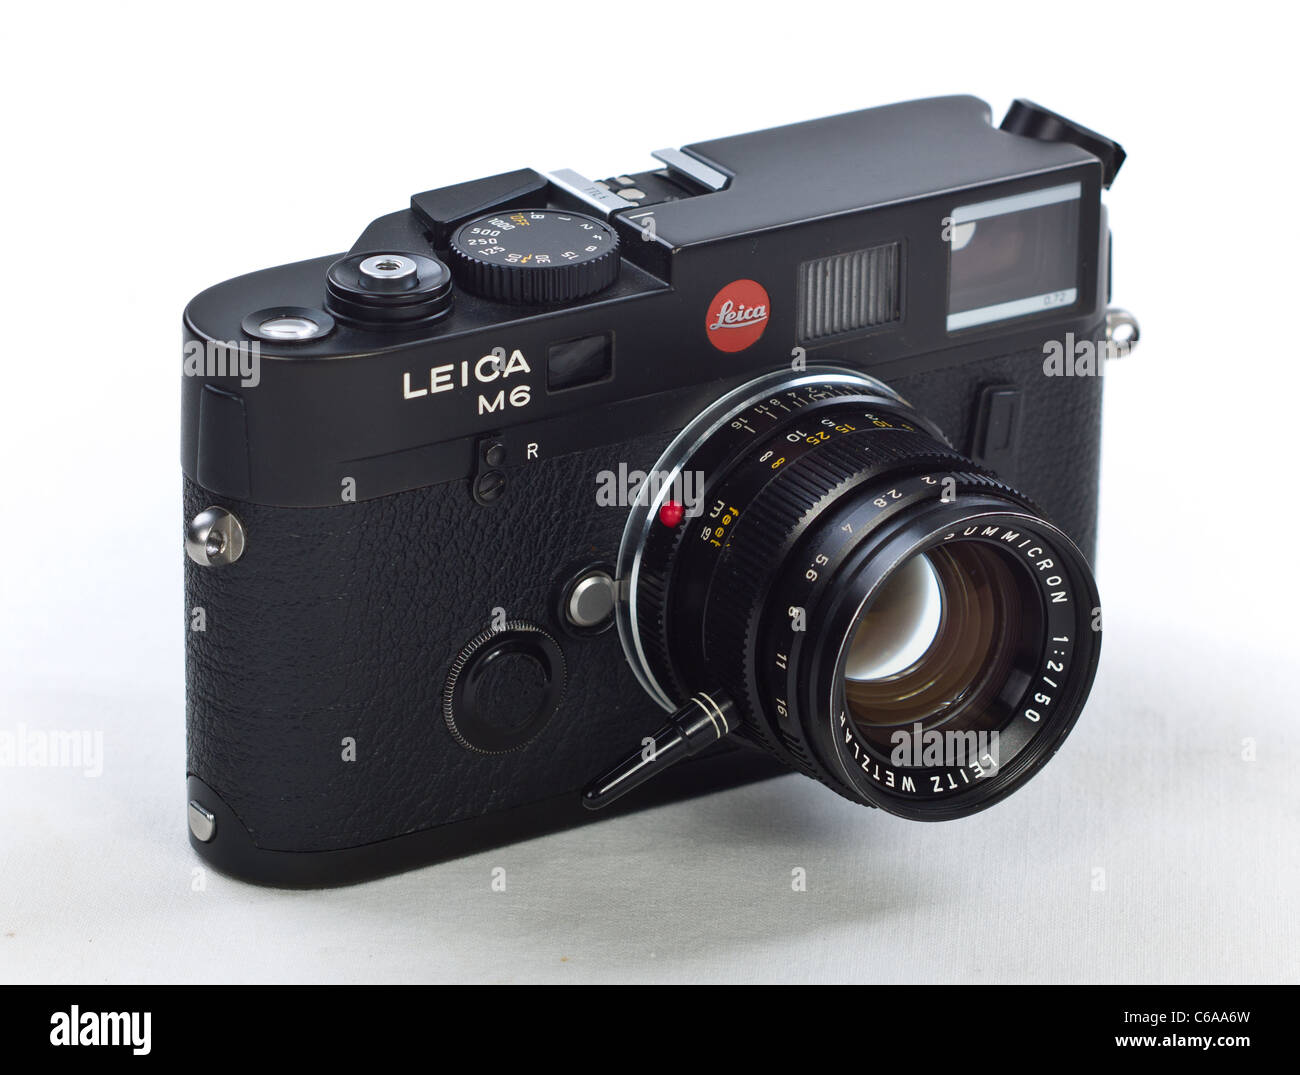 Leica Entfernungsmesser Kaufen : Leica m ttl entfernungsmesser rf mm filmkamera mit classic